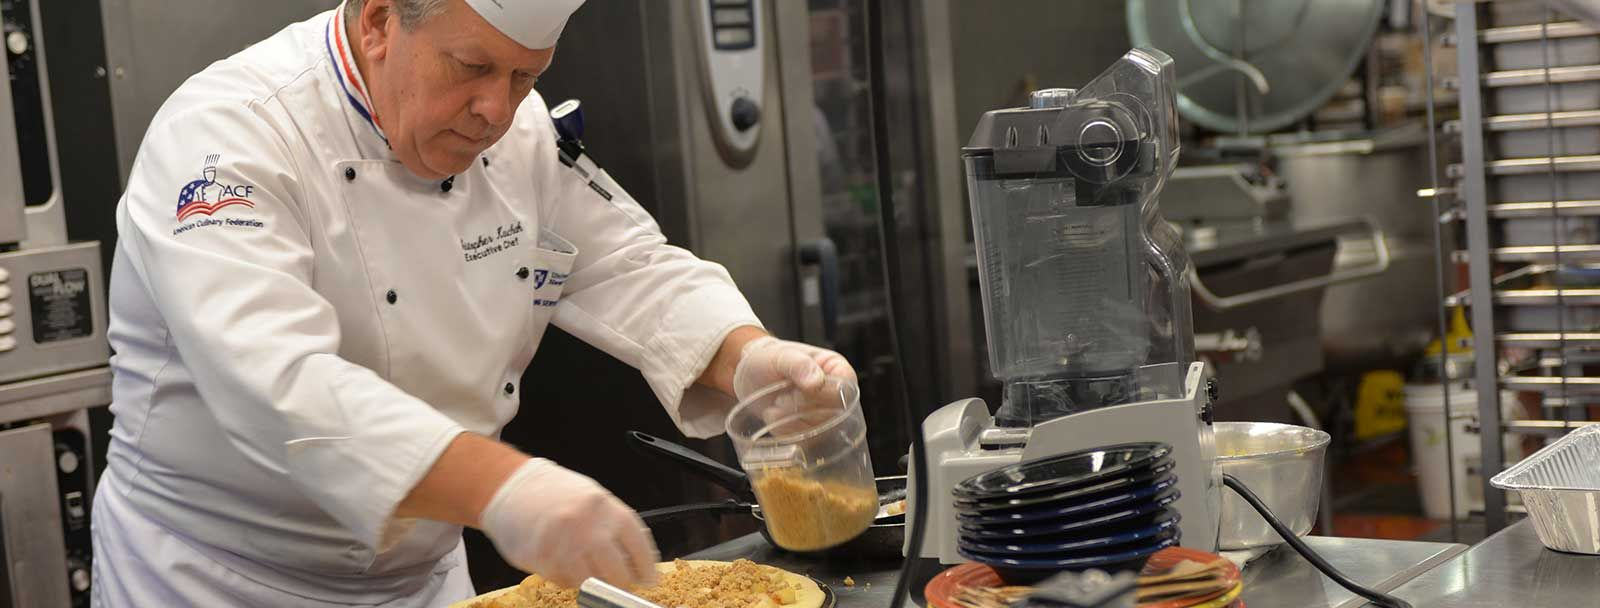 UNH Executive Chef Chris Kaschak makes apple-cheddar pizza